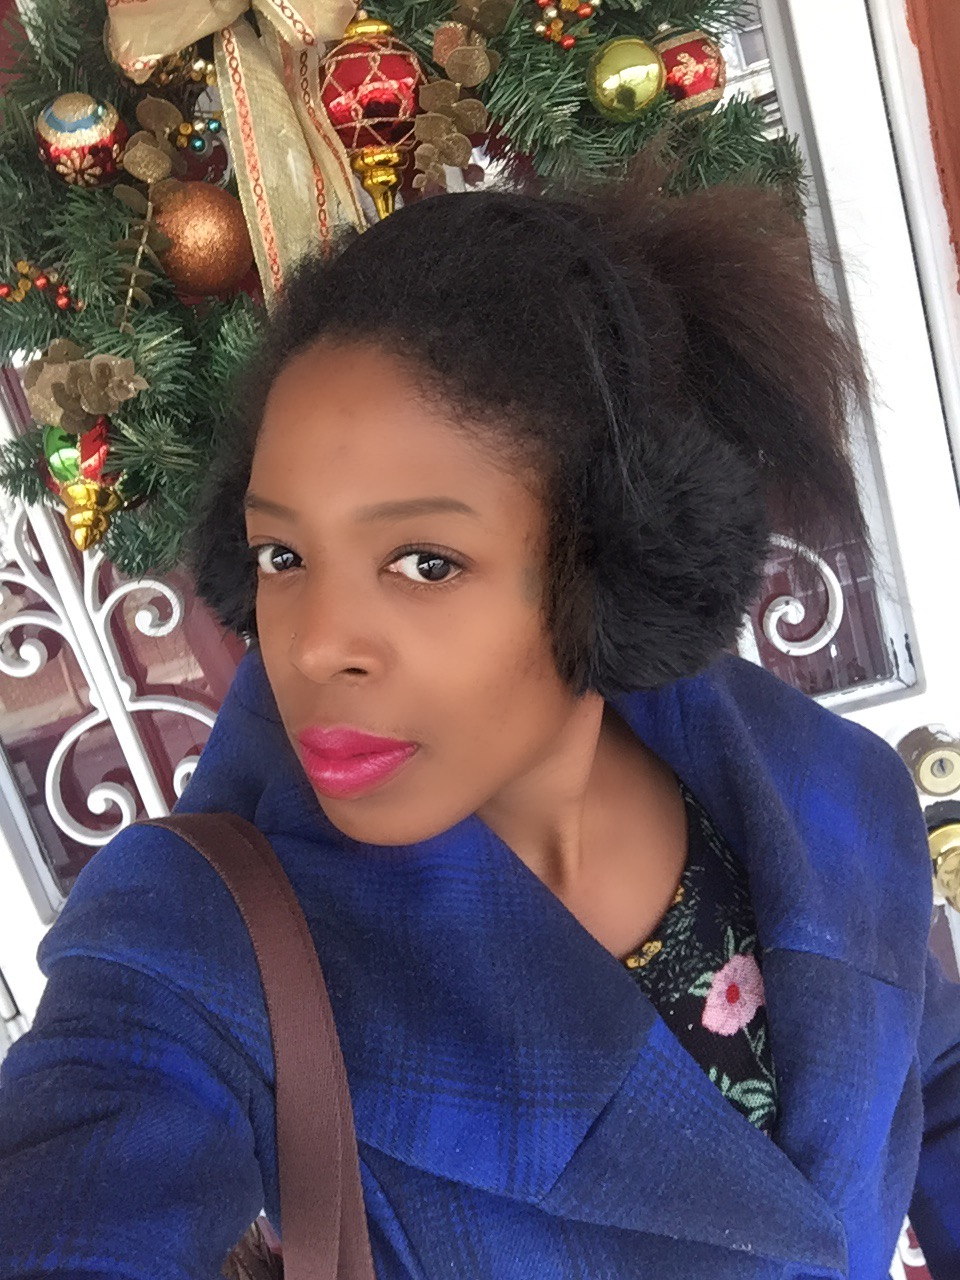 burts-bees-lipstick-review-2